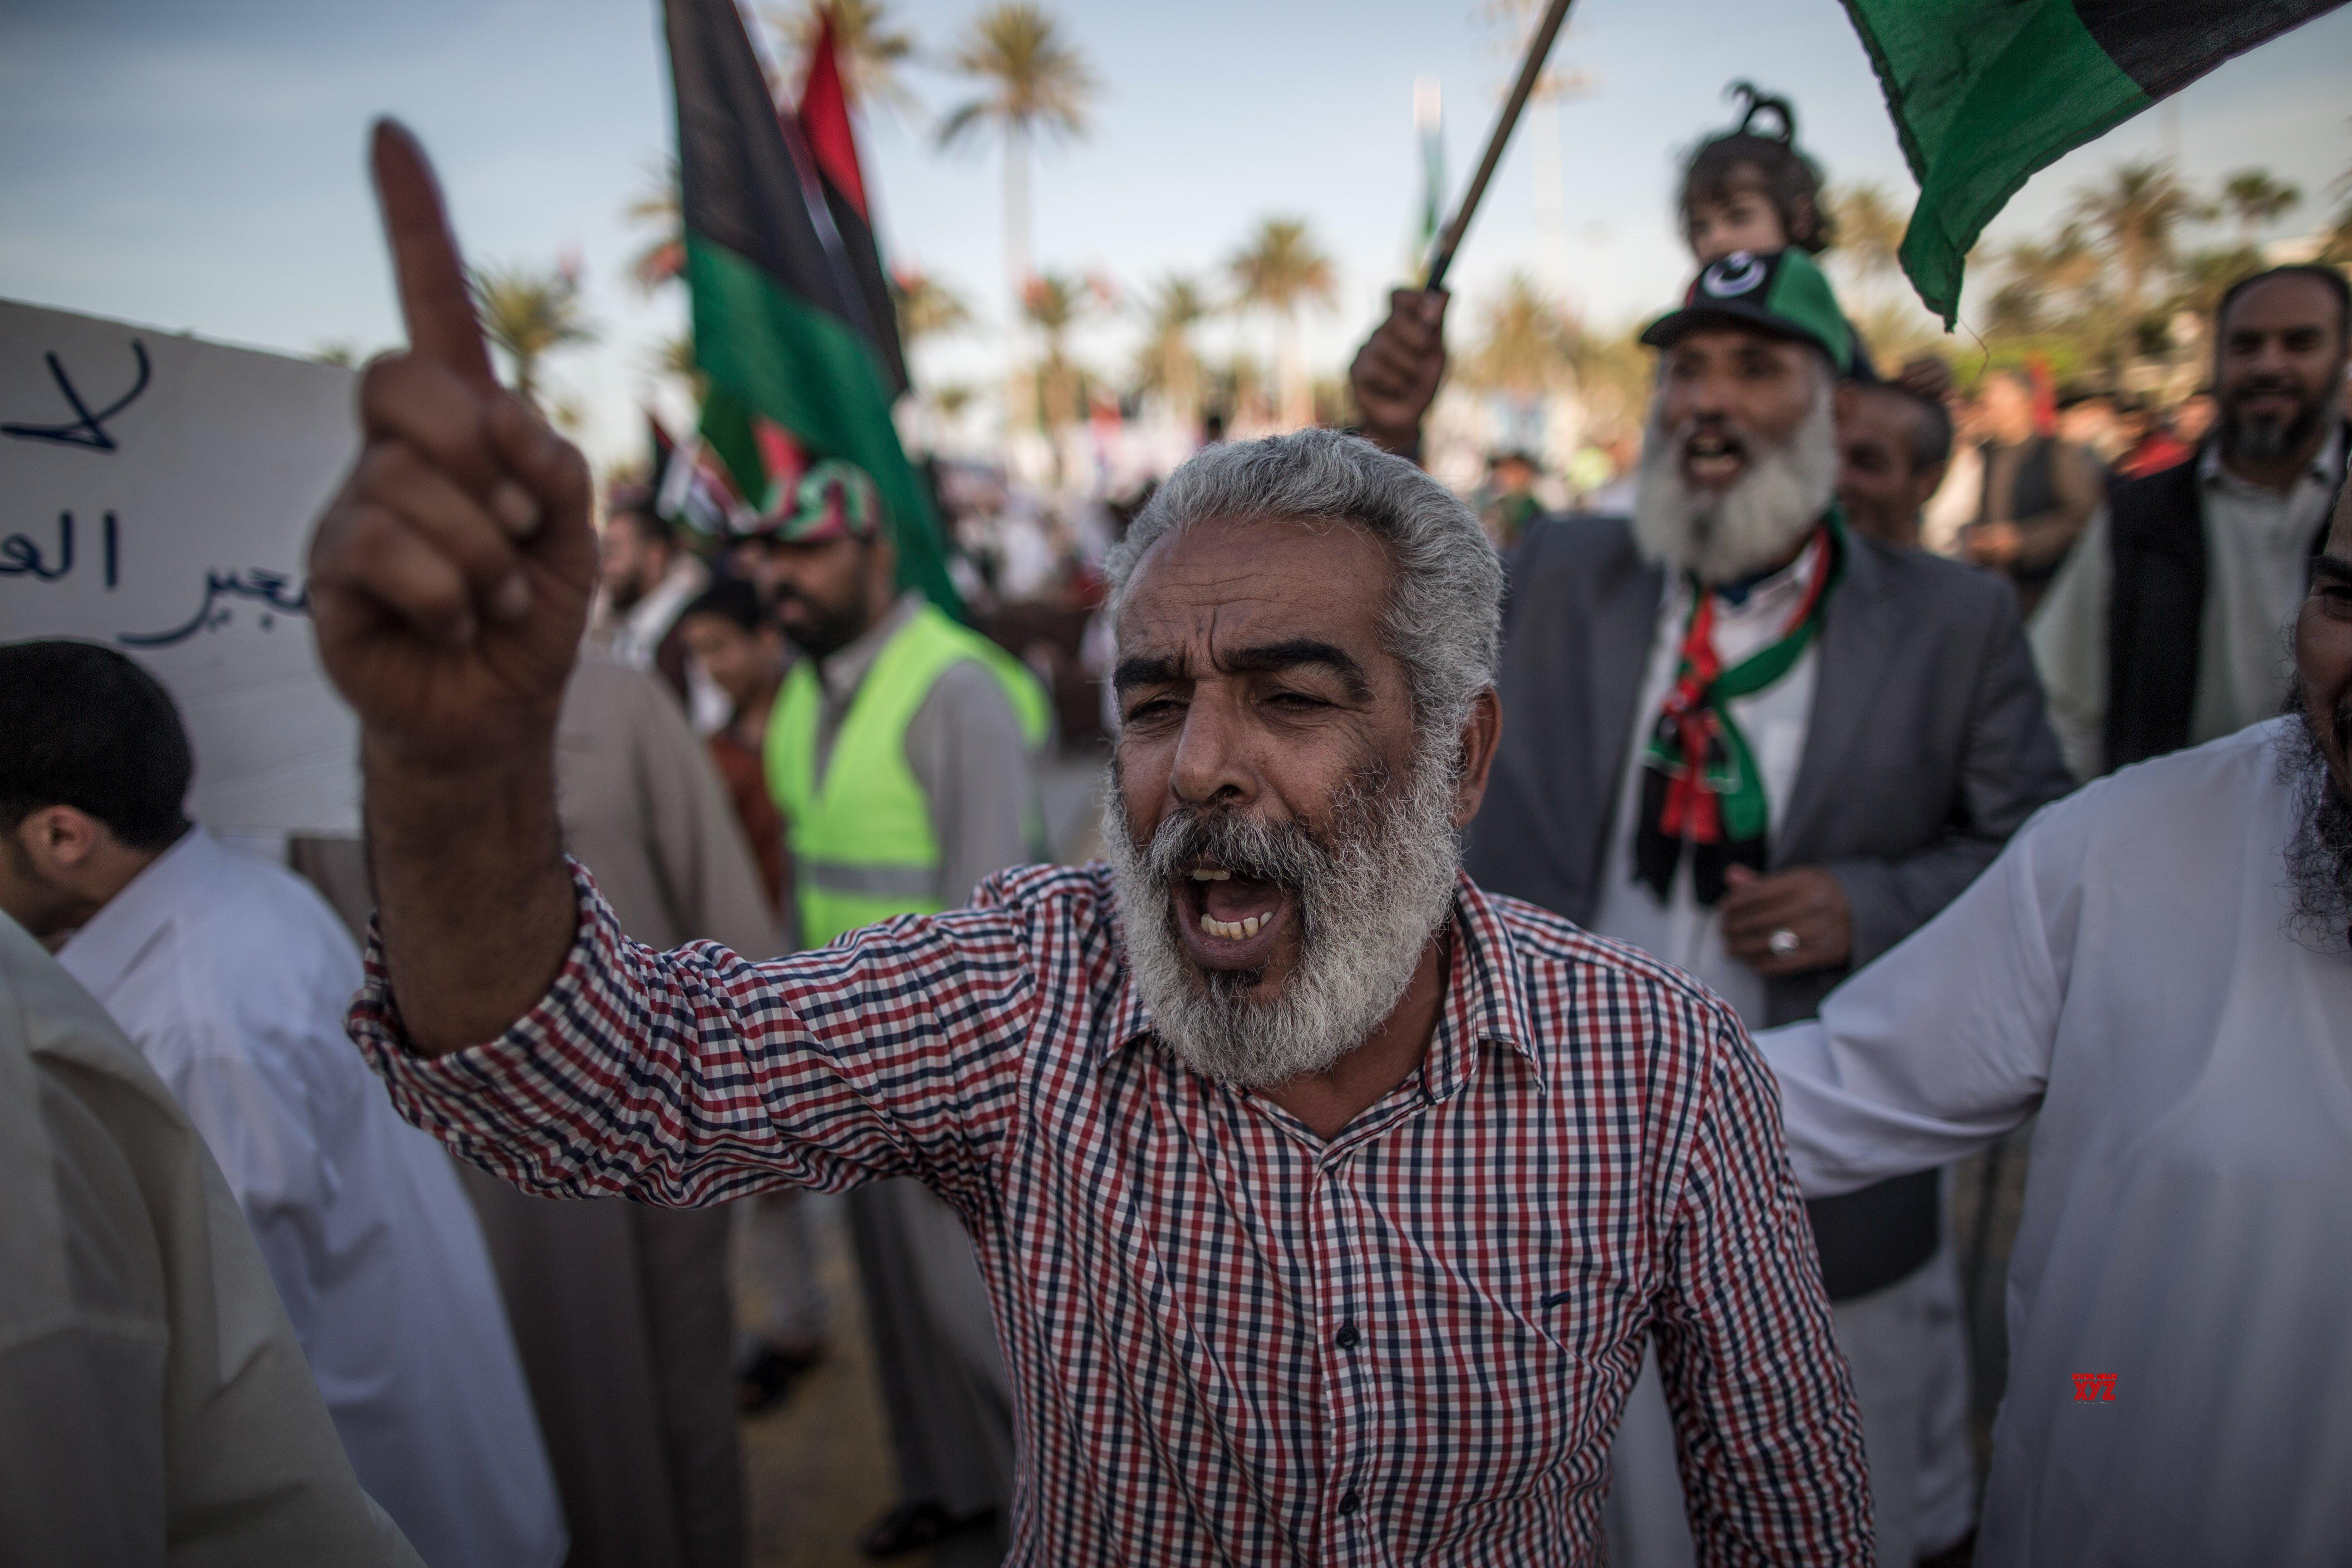 LIBYA - TRIPOLI - PROTEST #Gallery